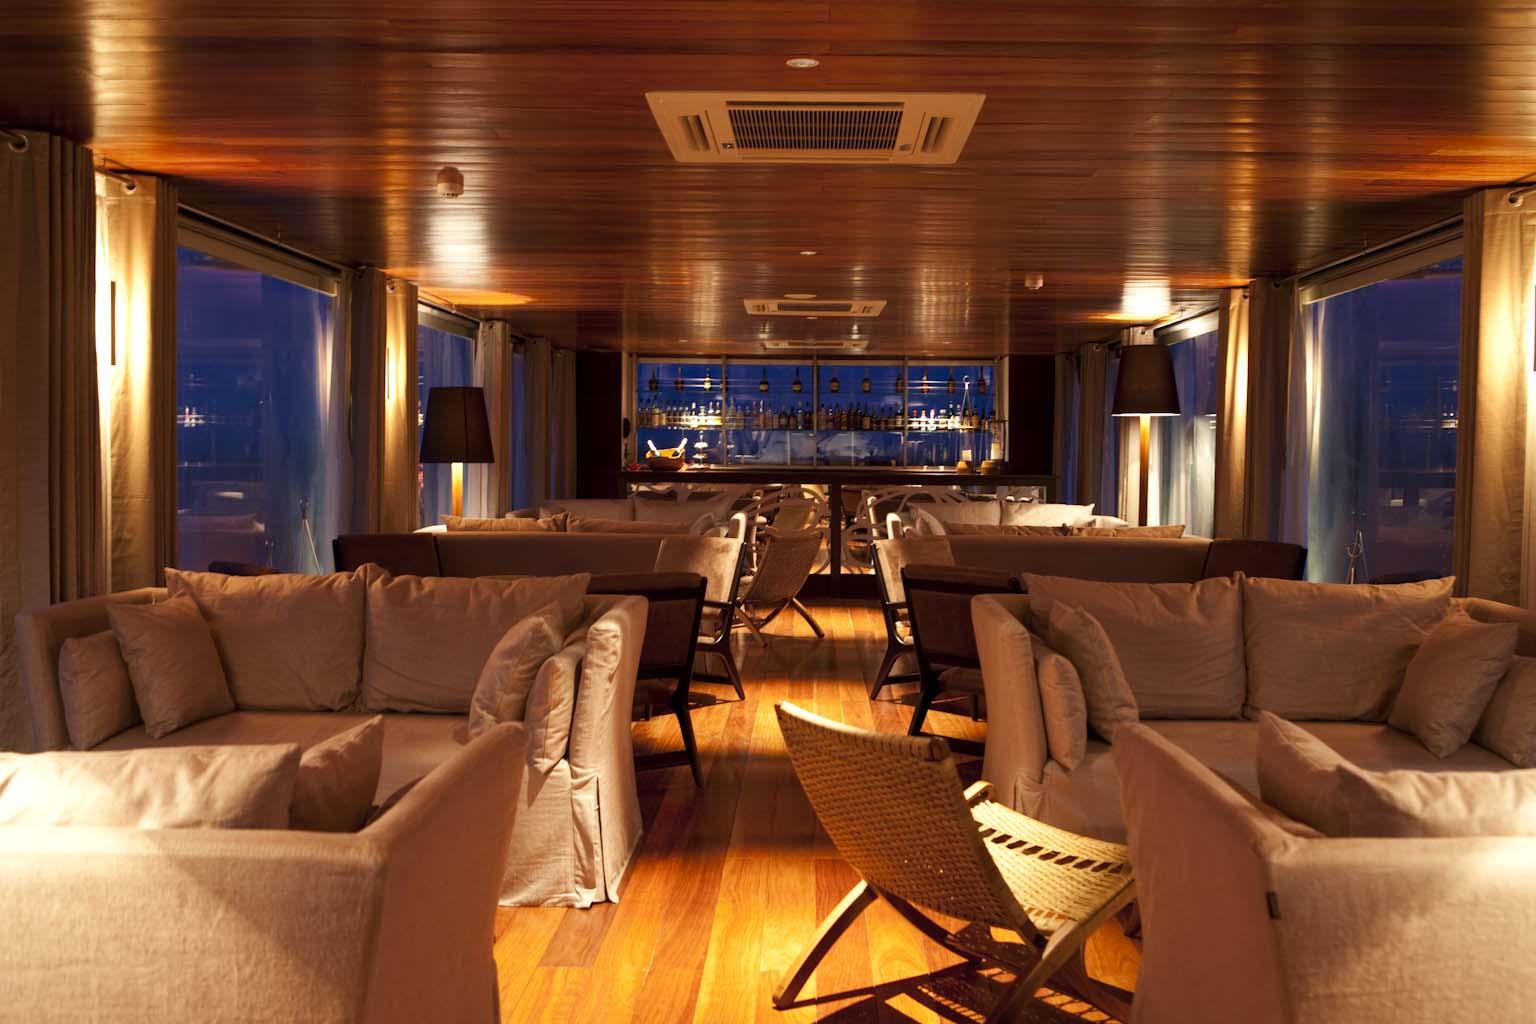 MV Aqua Luxury Amazon Cruise